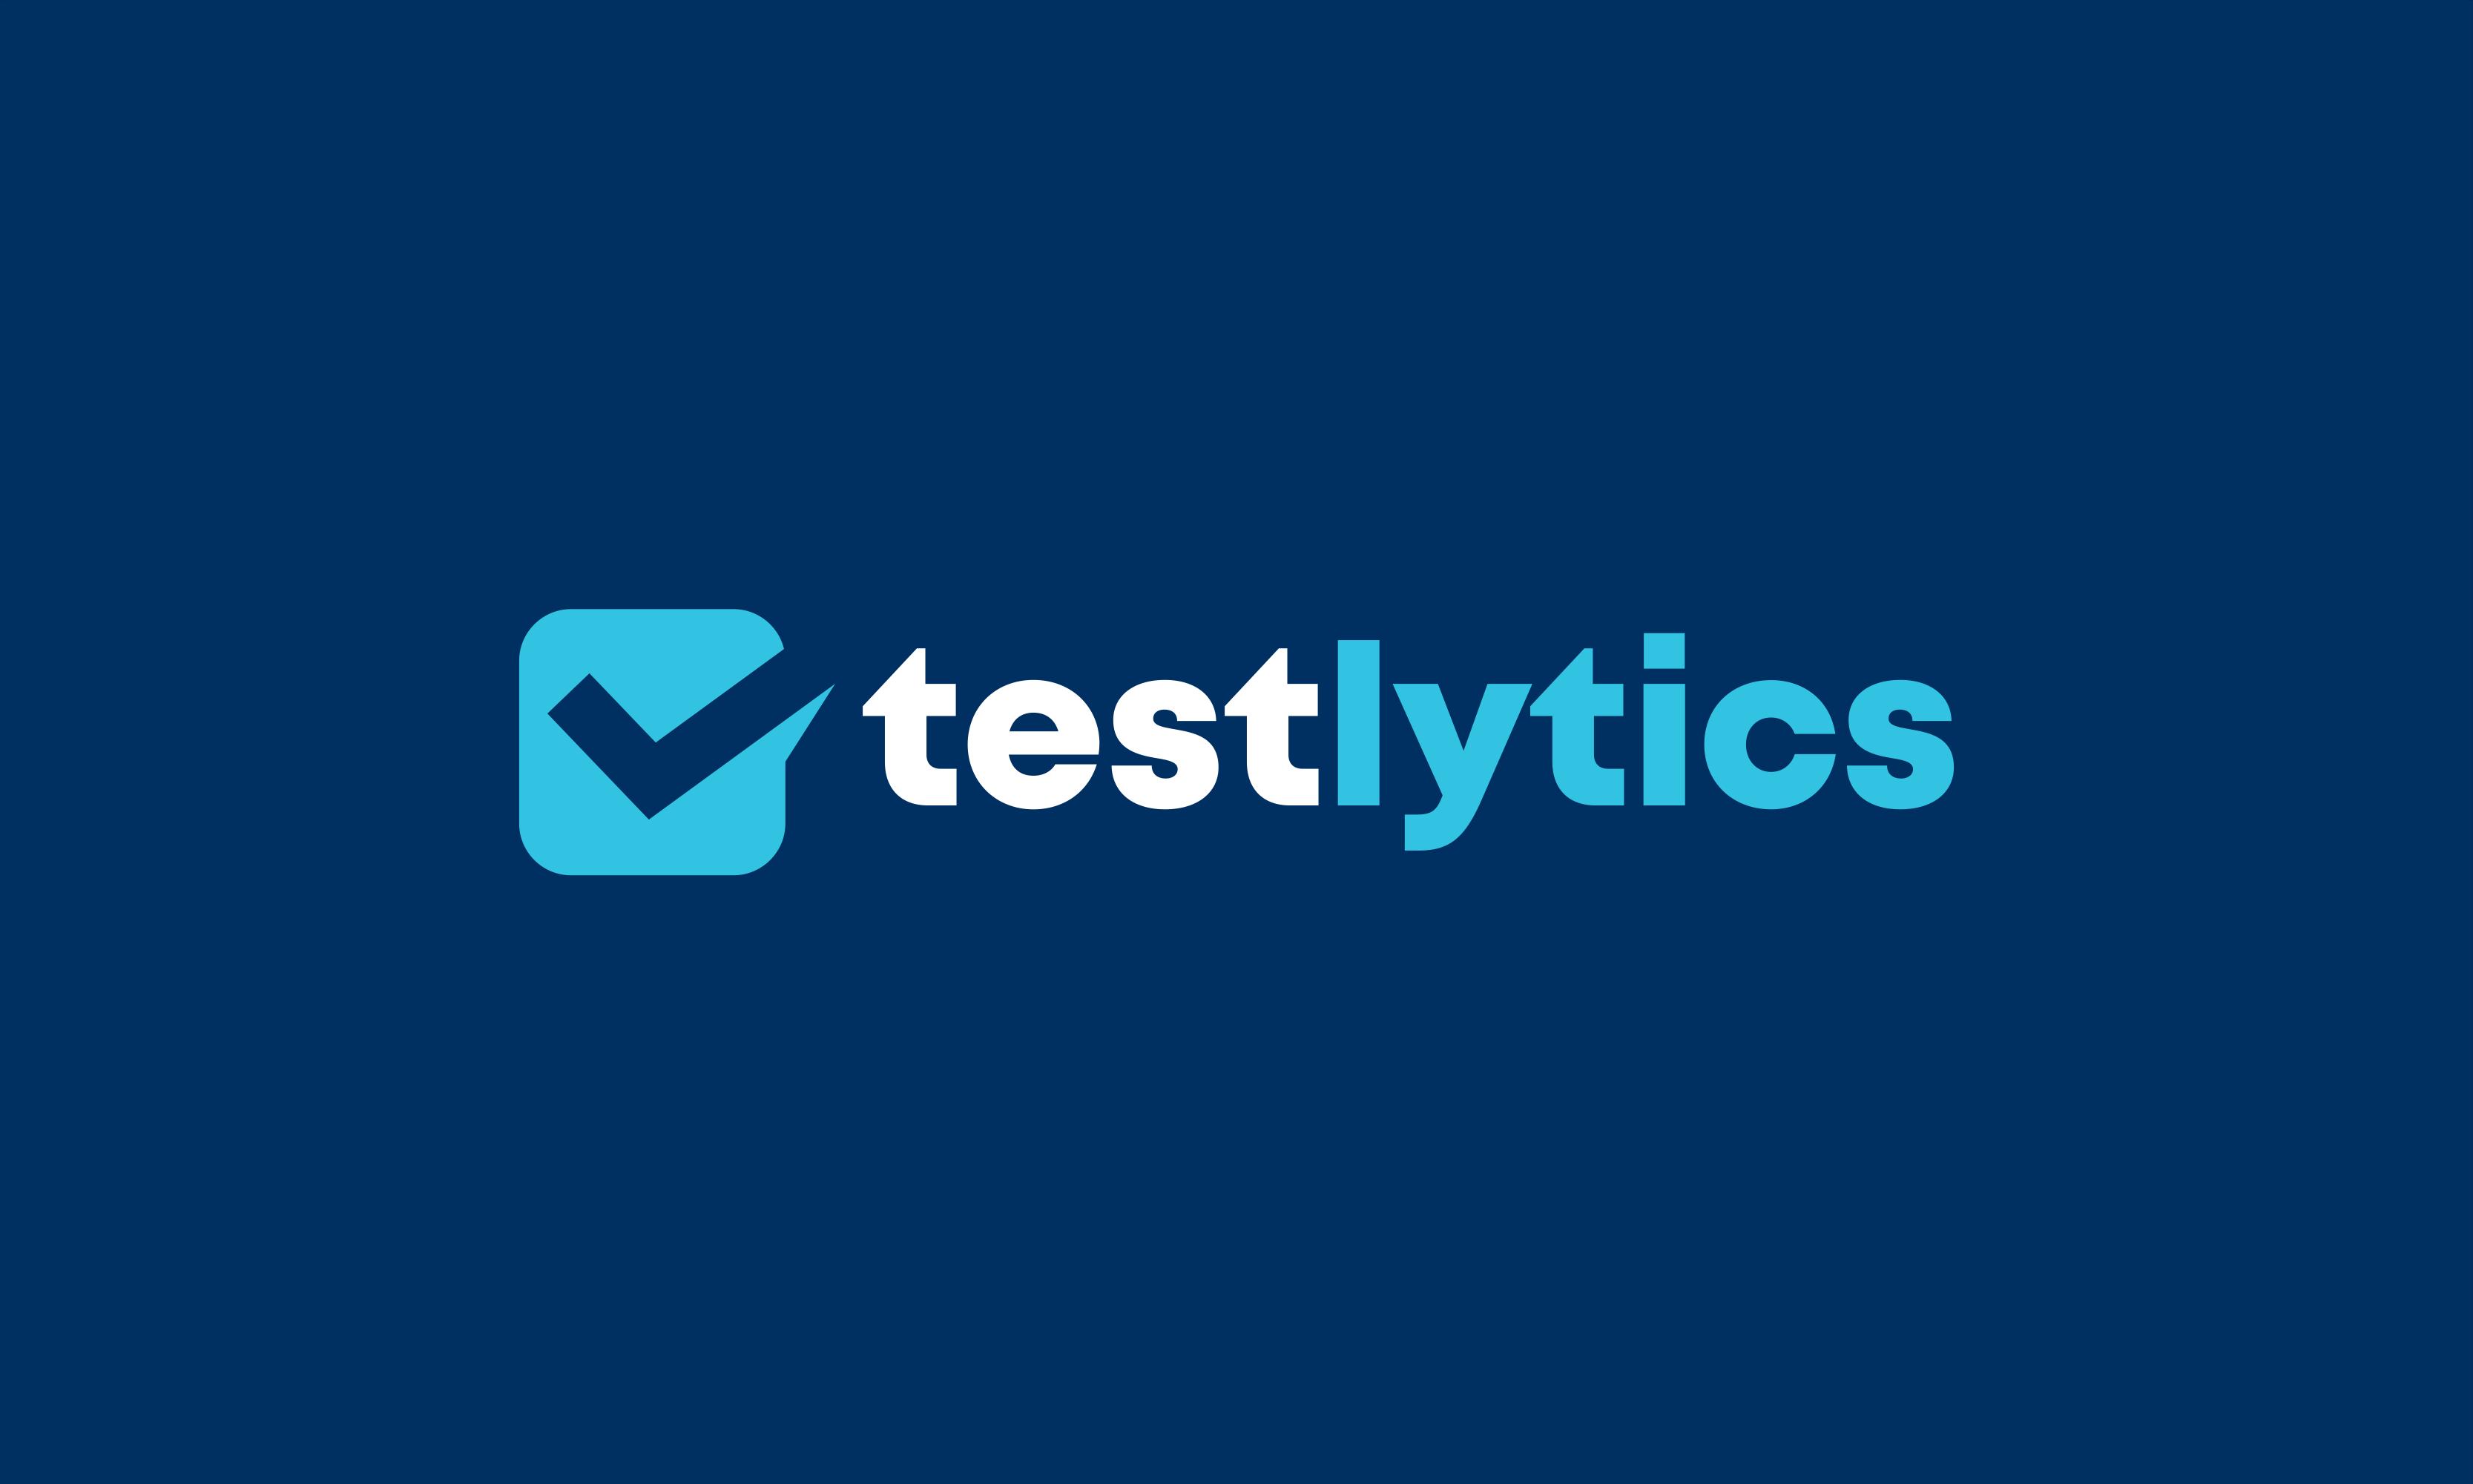 Testlytics